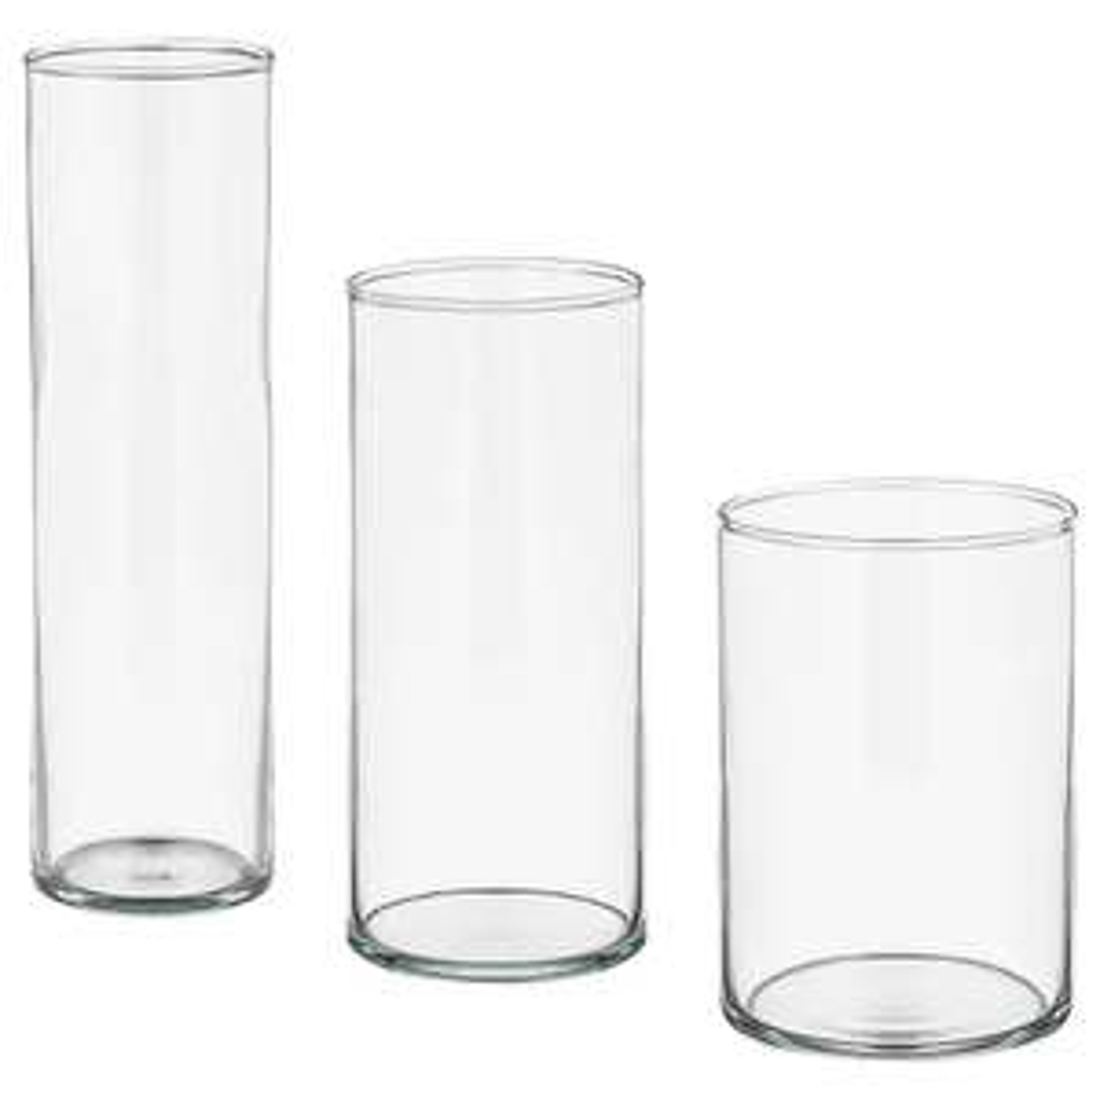 Cylinder Vase, set of 3, now £10 @ Ikea instore